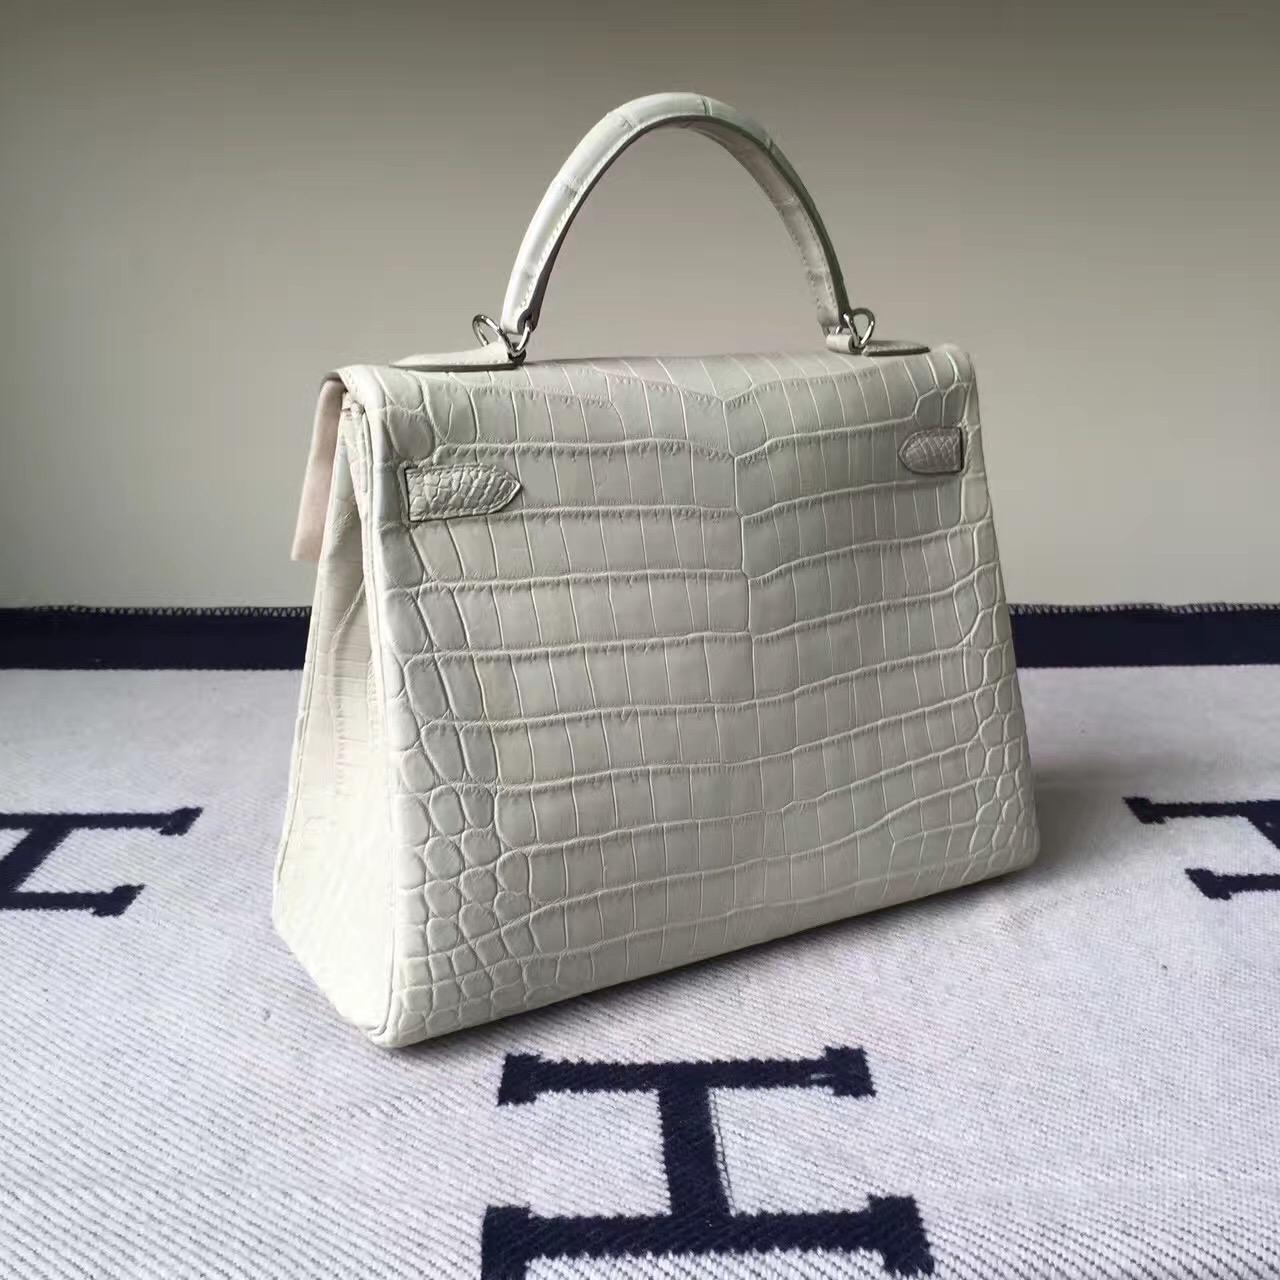 Discount Hermes Crocodile Matt Leather Retourne Kelly Bag32CM in 8L Beton White